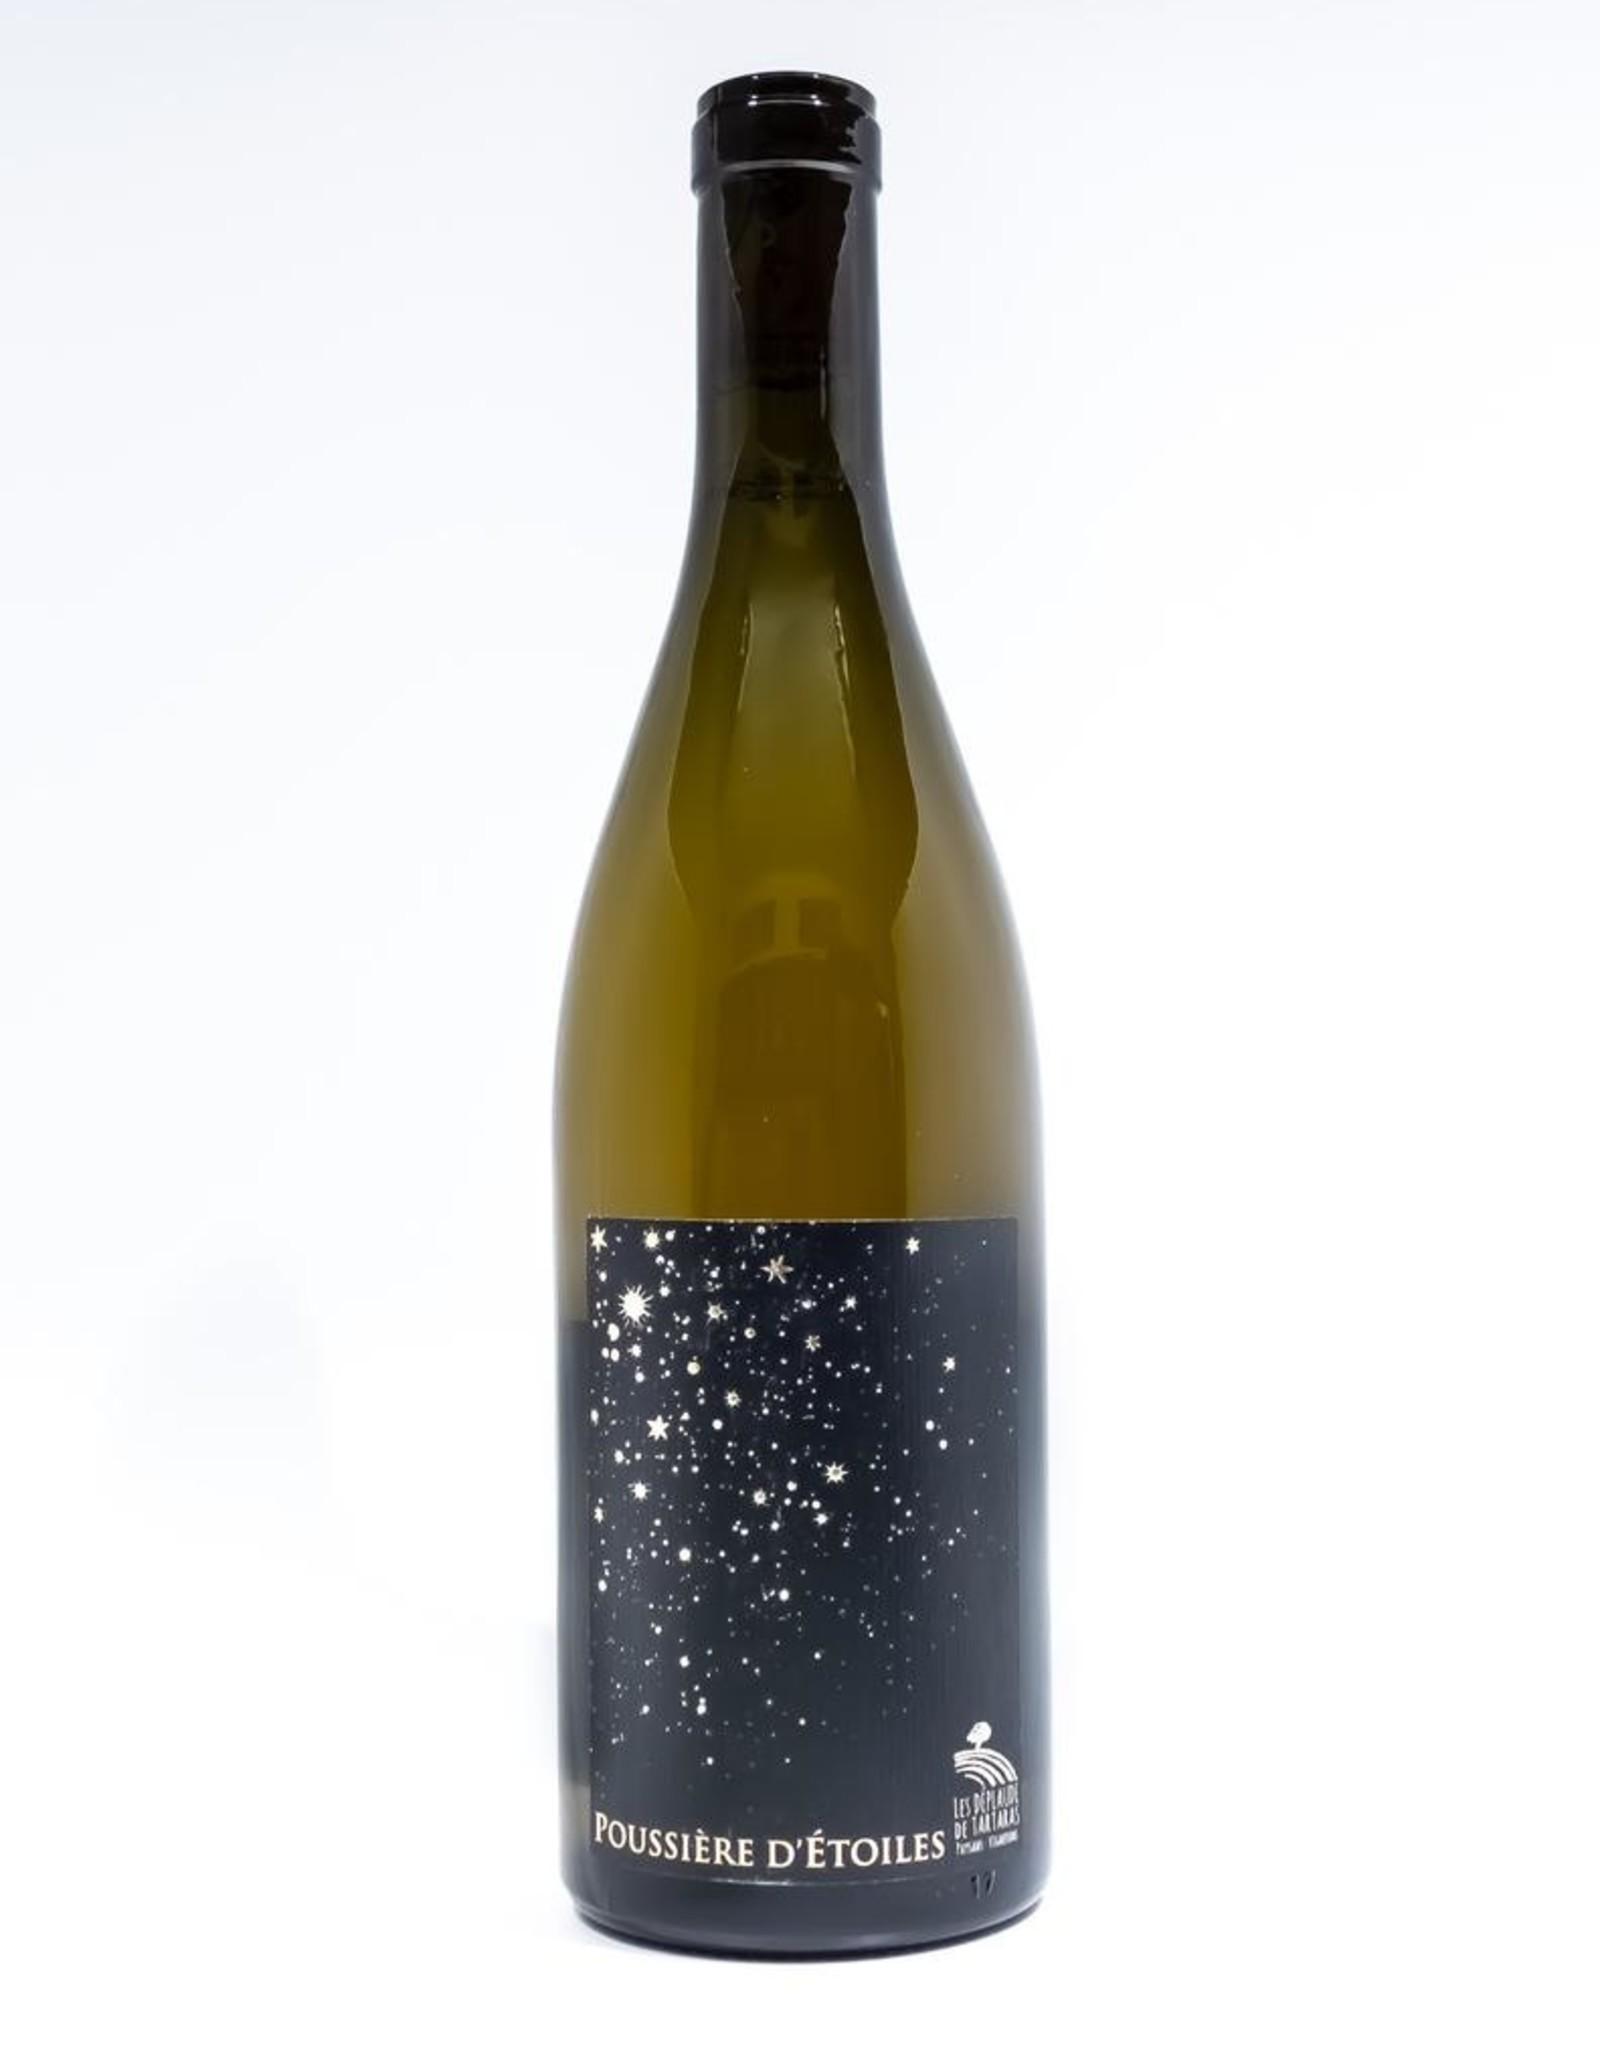 Wine-White-Round Les Deplaude de Tartaras Chardonnay-Viognier 'Poussiere d'Etoiles' VdF 2016